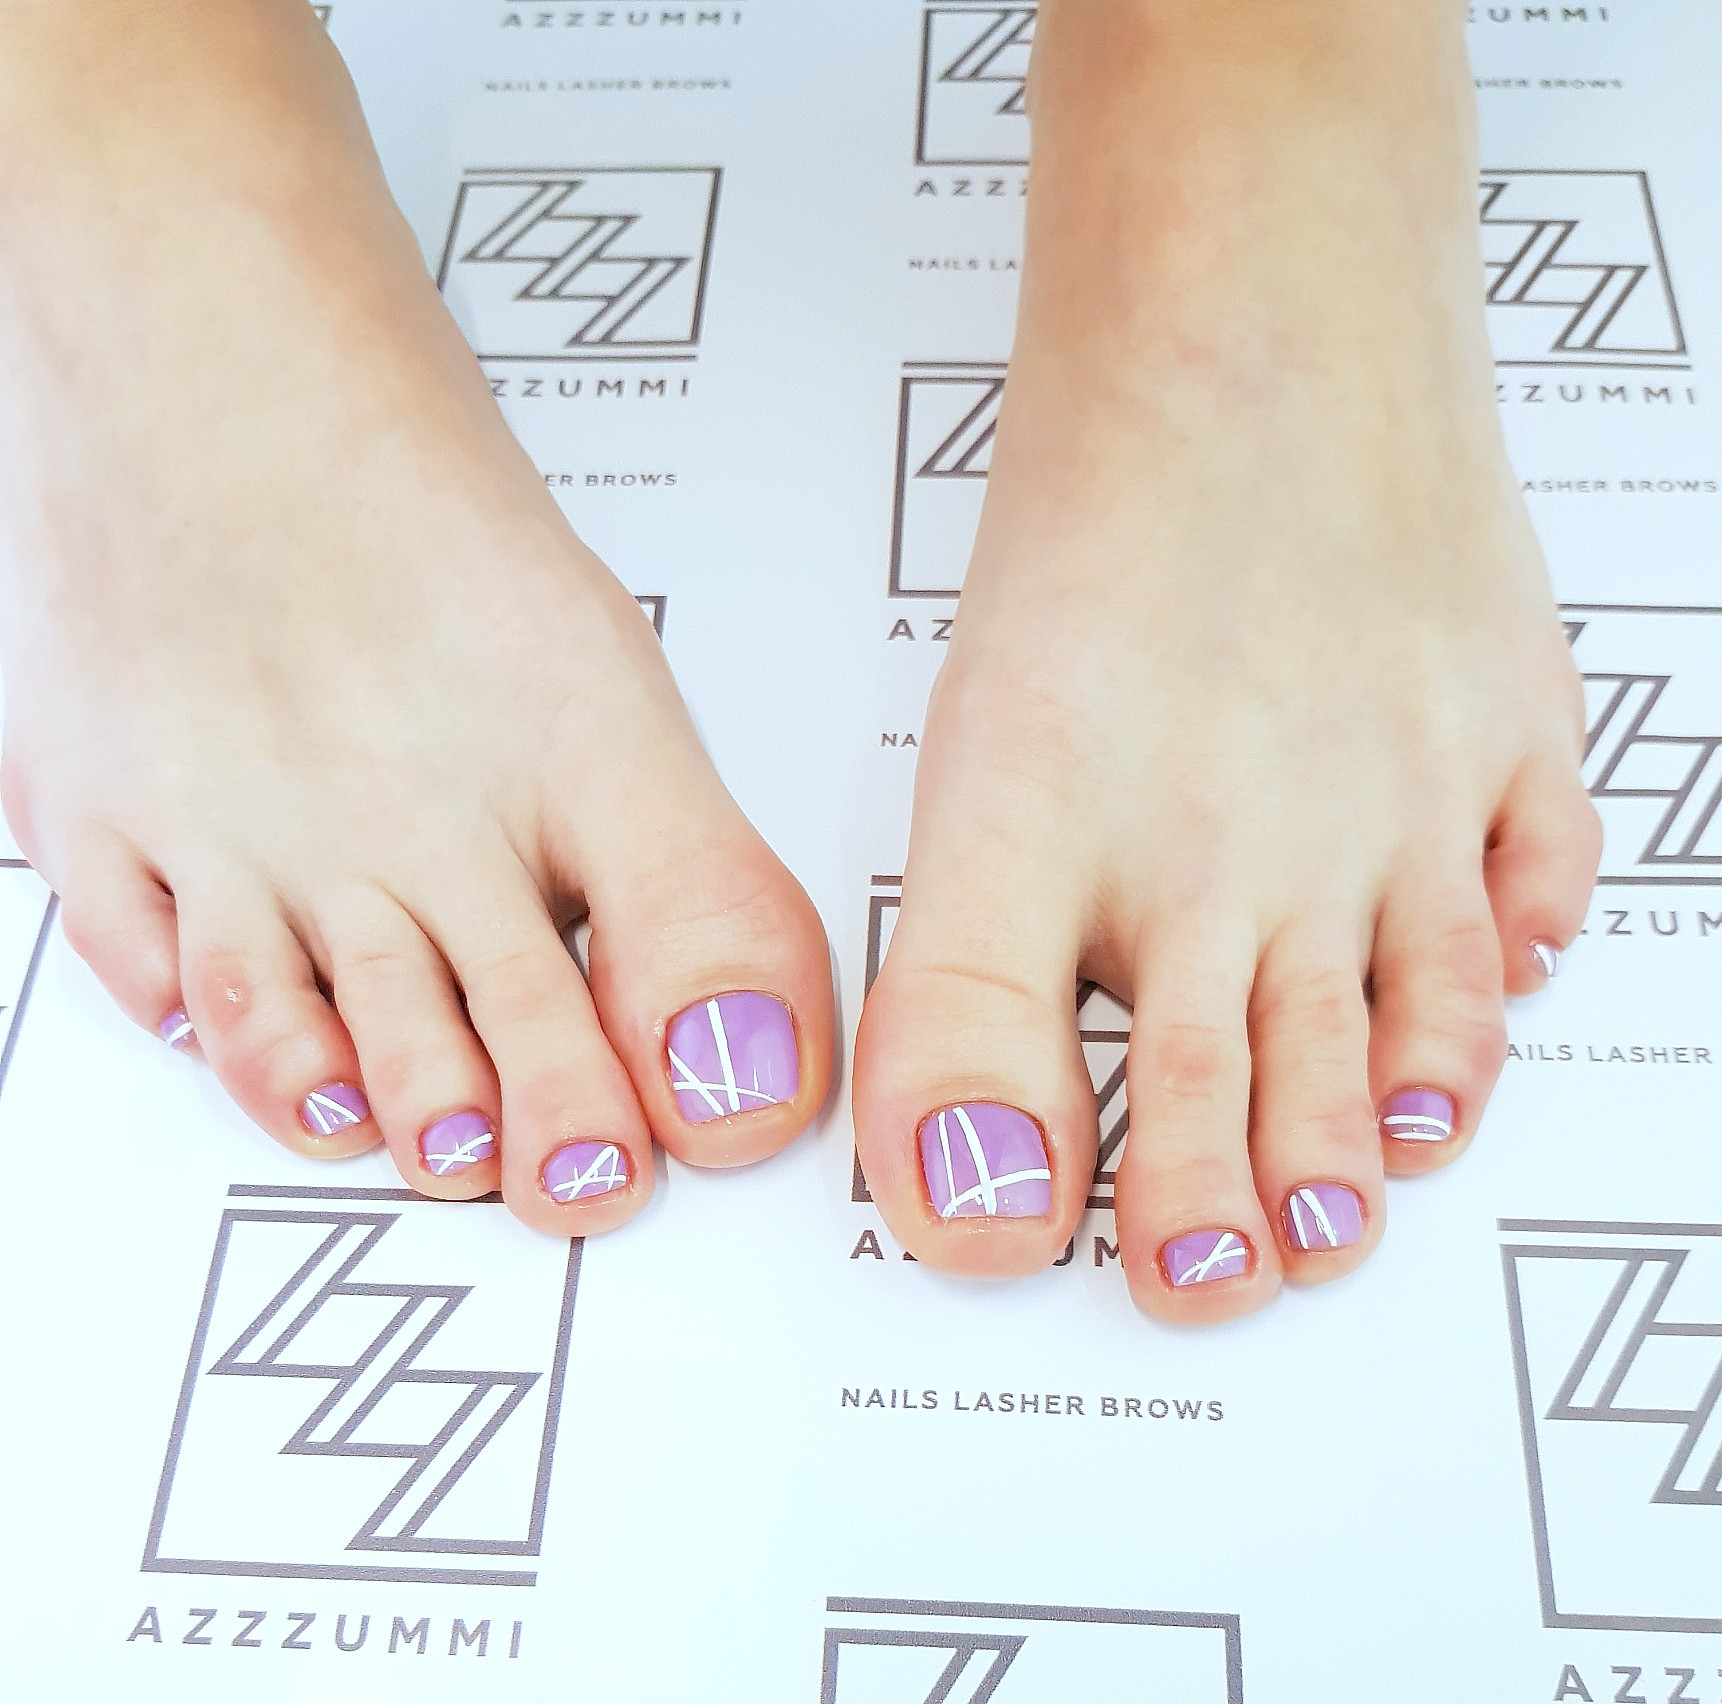 Azzzummi_маникюр_ 1905_ножки